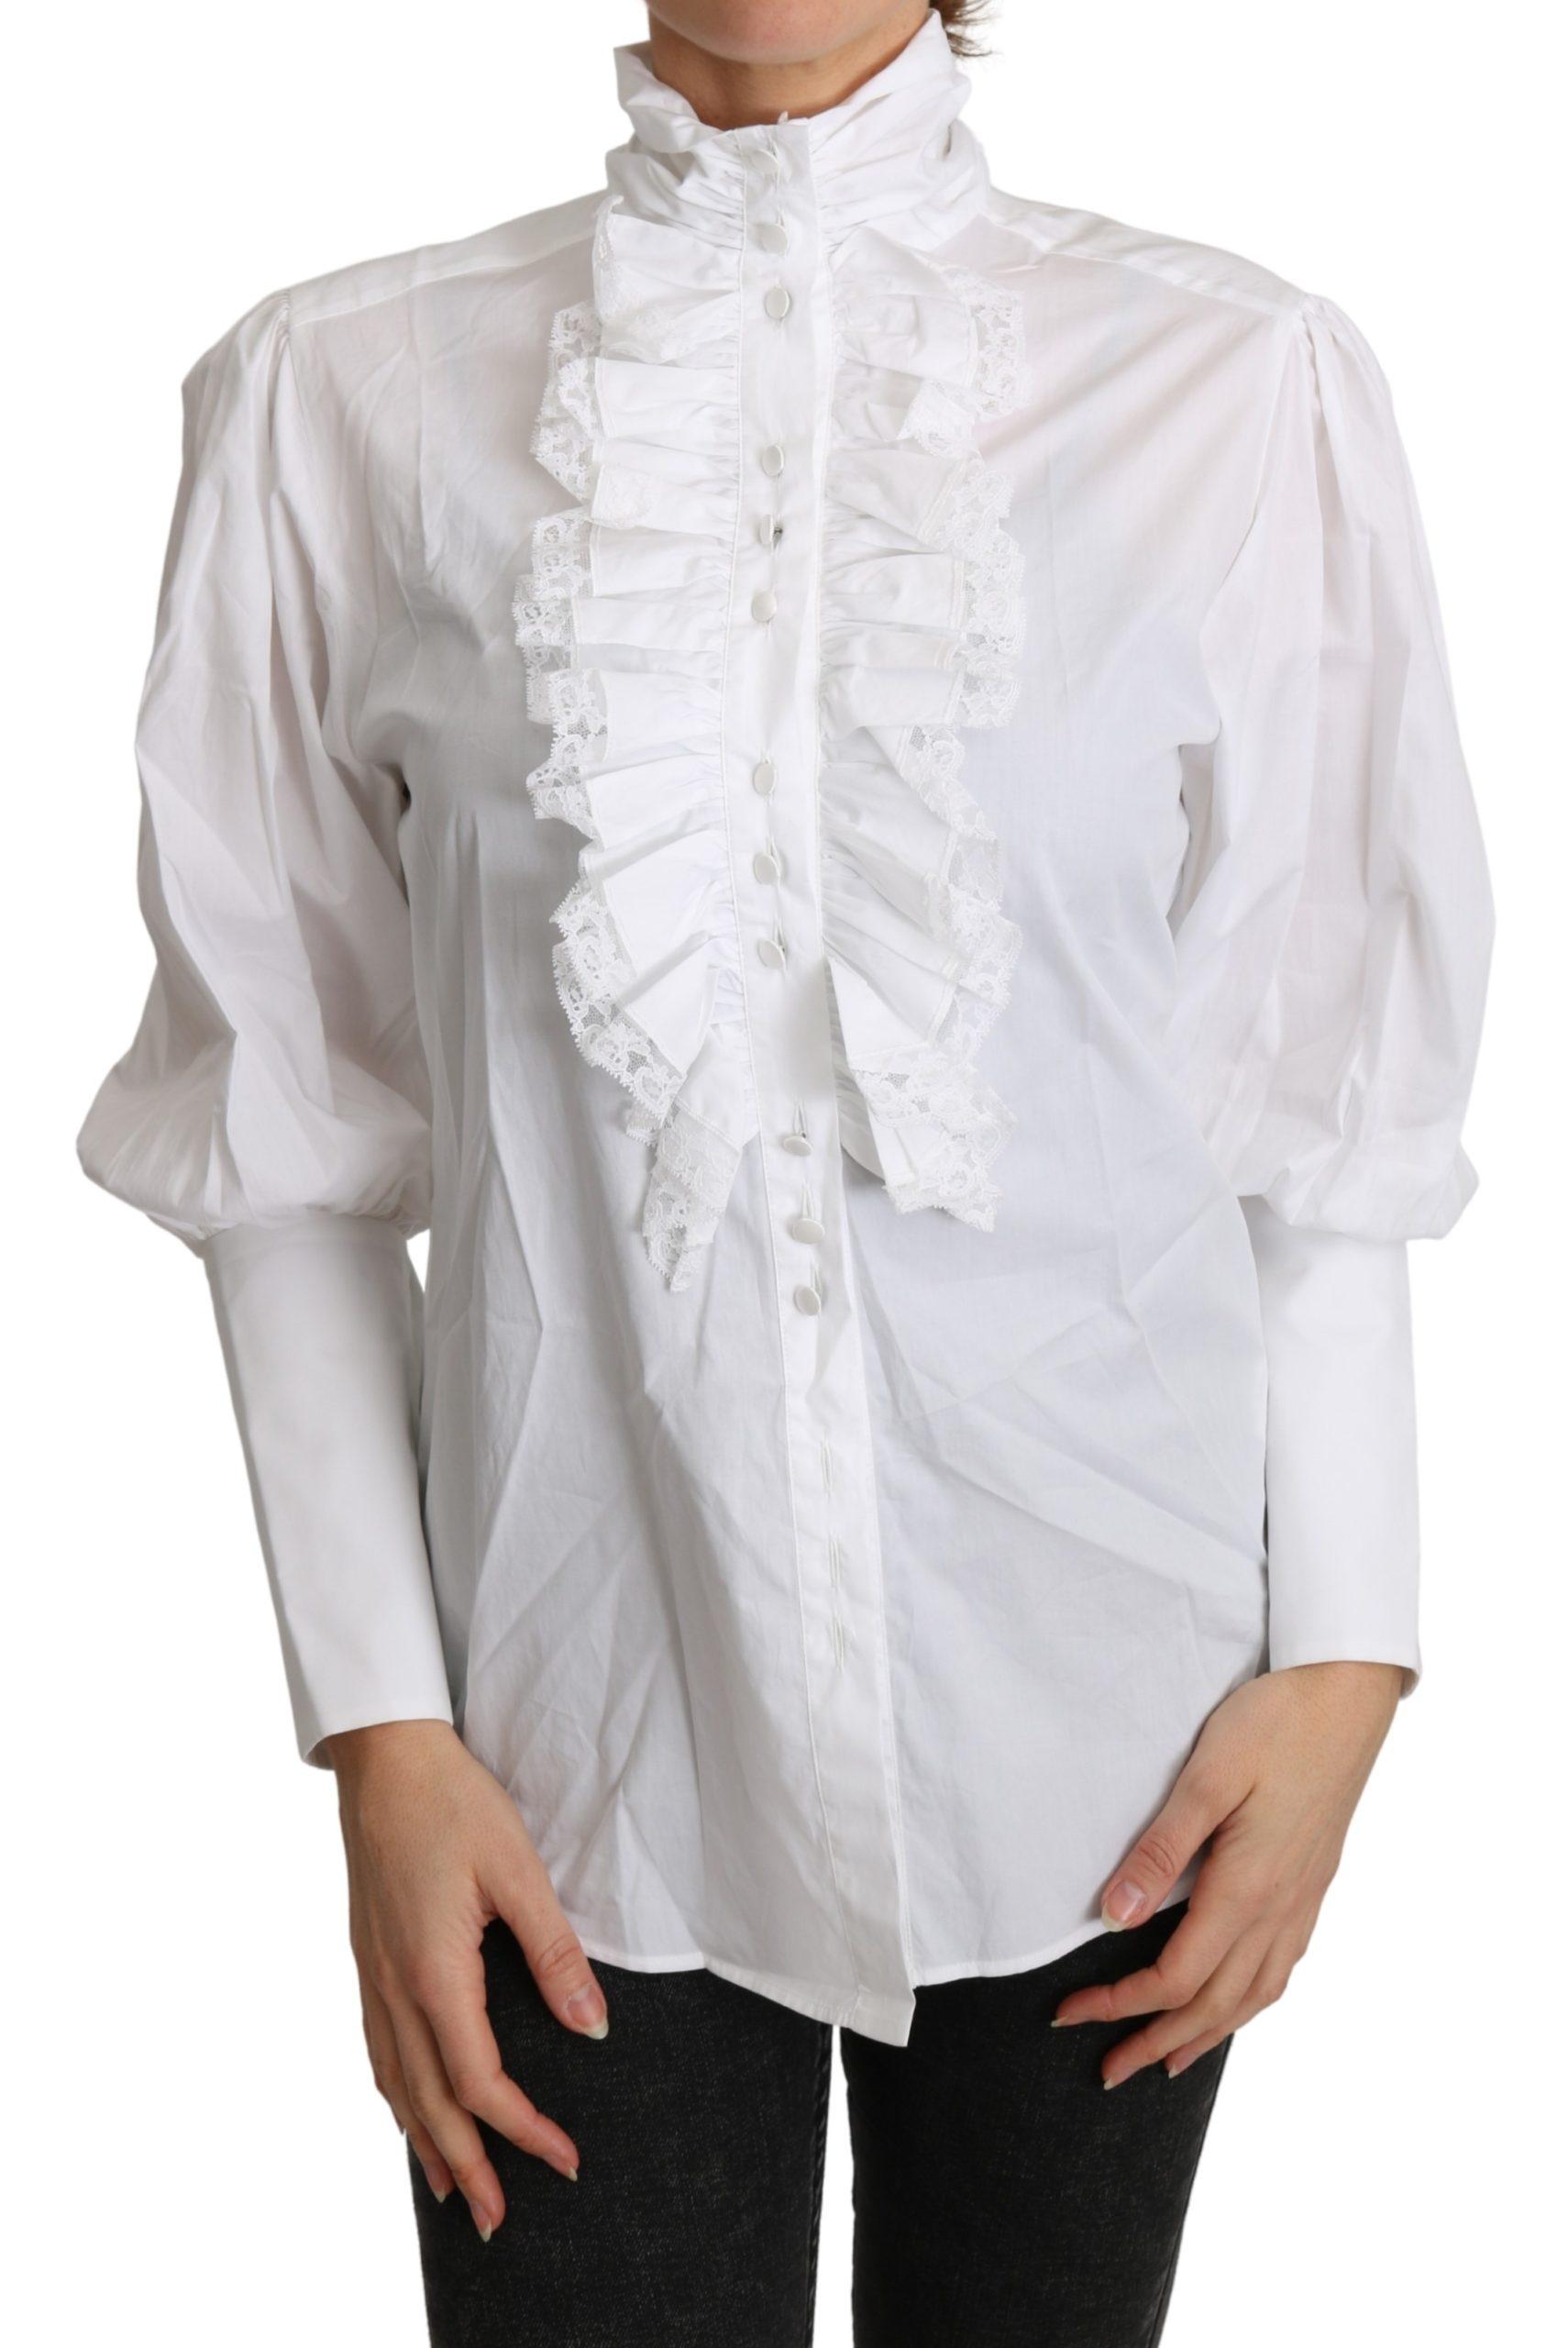 Dolce & Gabbana Women's Turtle Neck Long Sleeves Top White TSH4831 - IT36 | XS